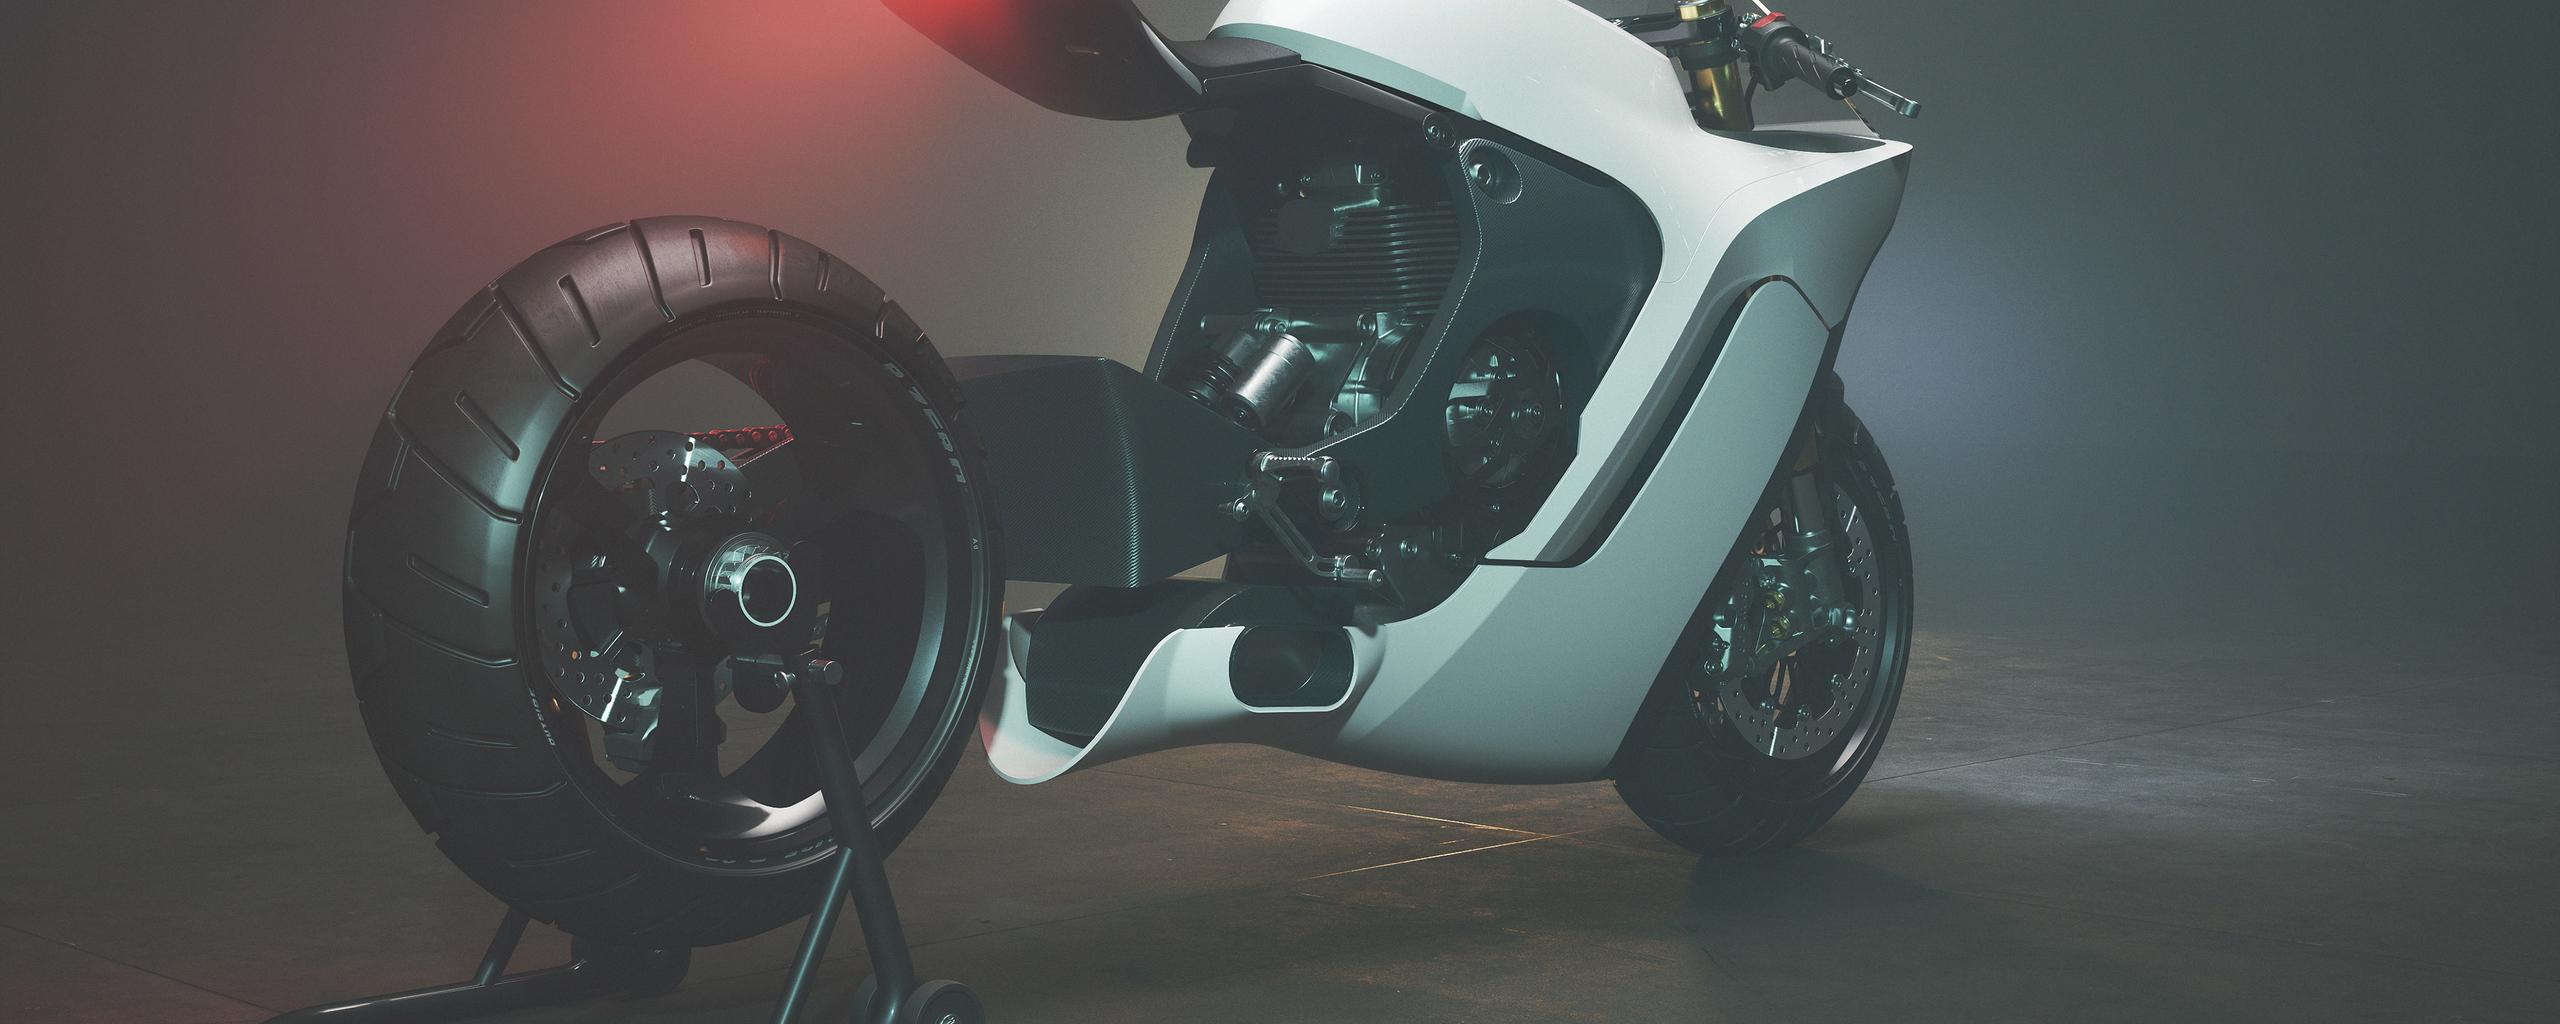 moto-racer-f-strom-cgi-dq.jpg